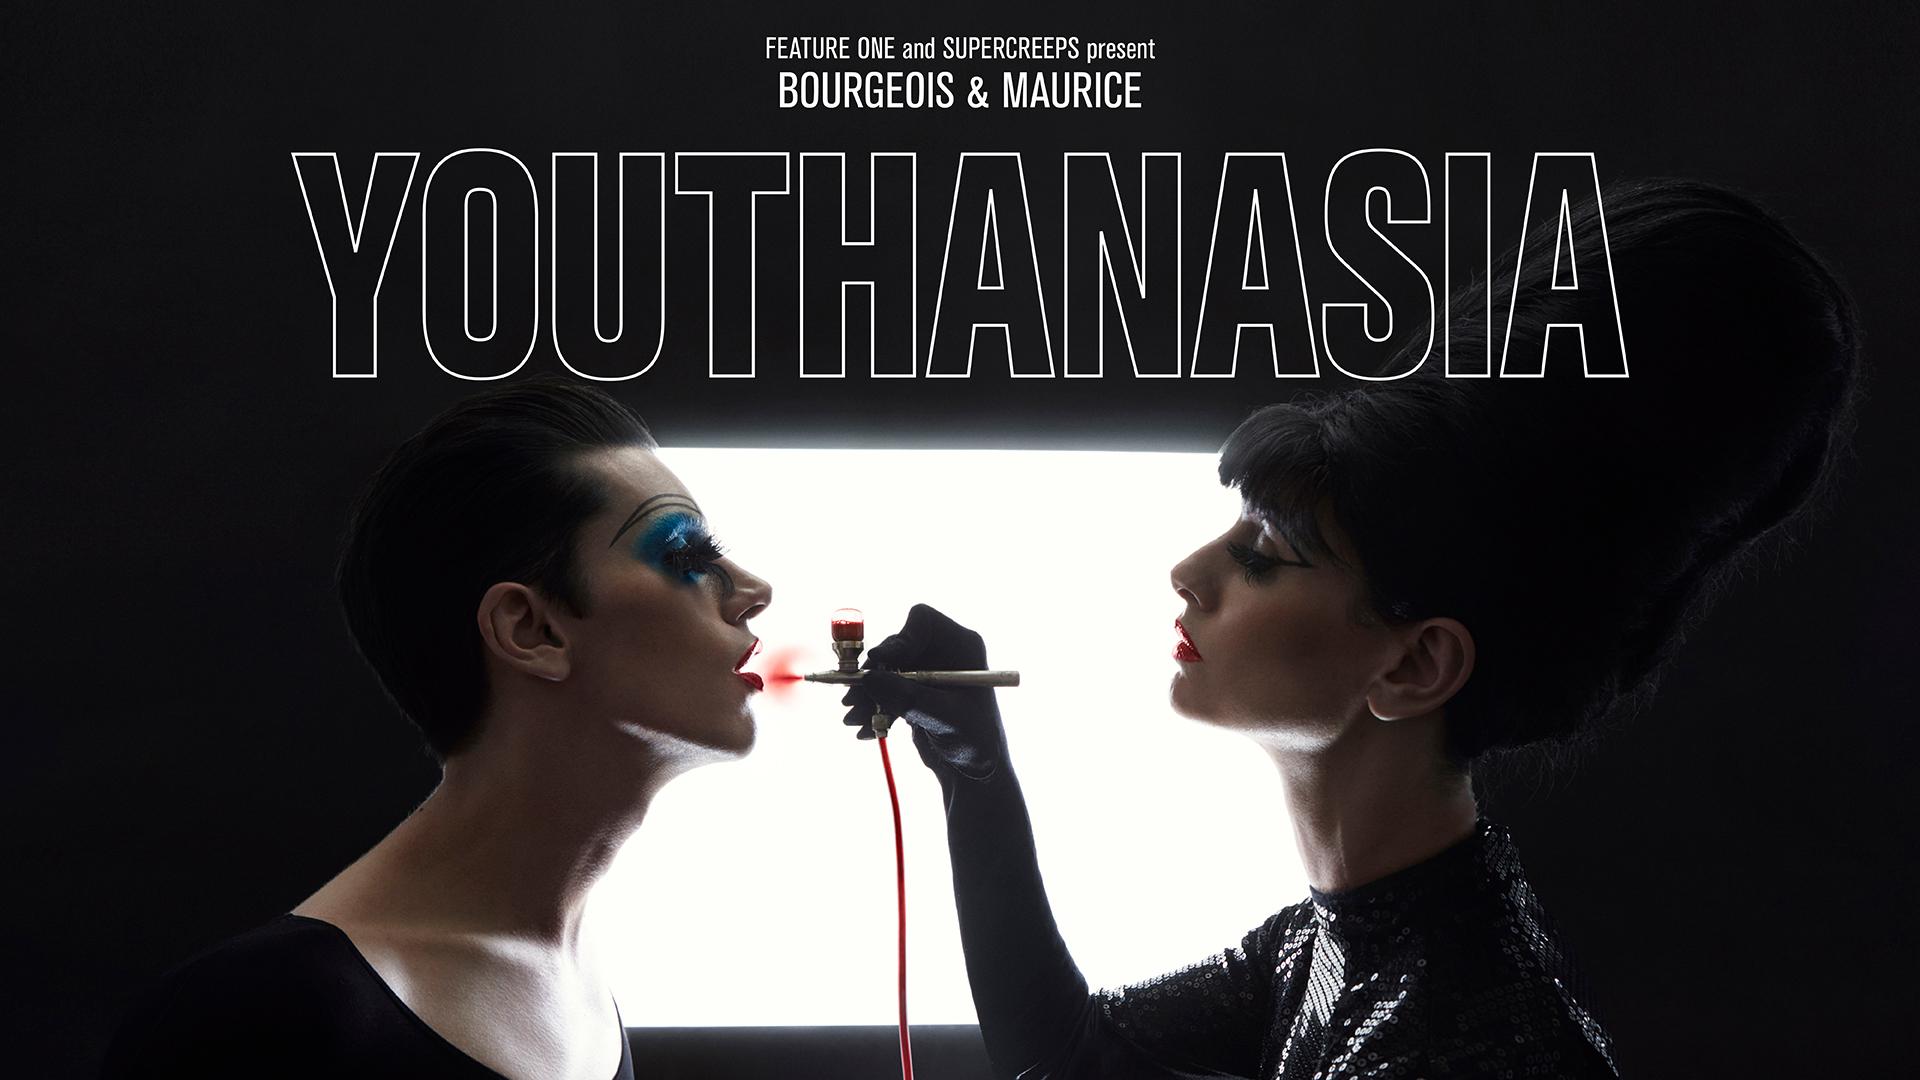 Bourgeois & Maurice: Youthanasia